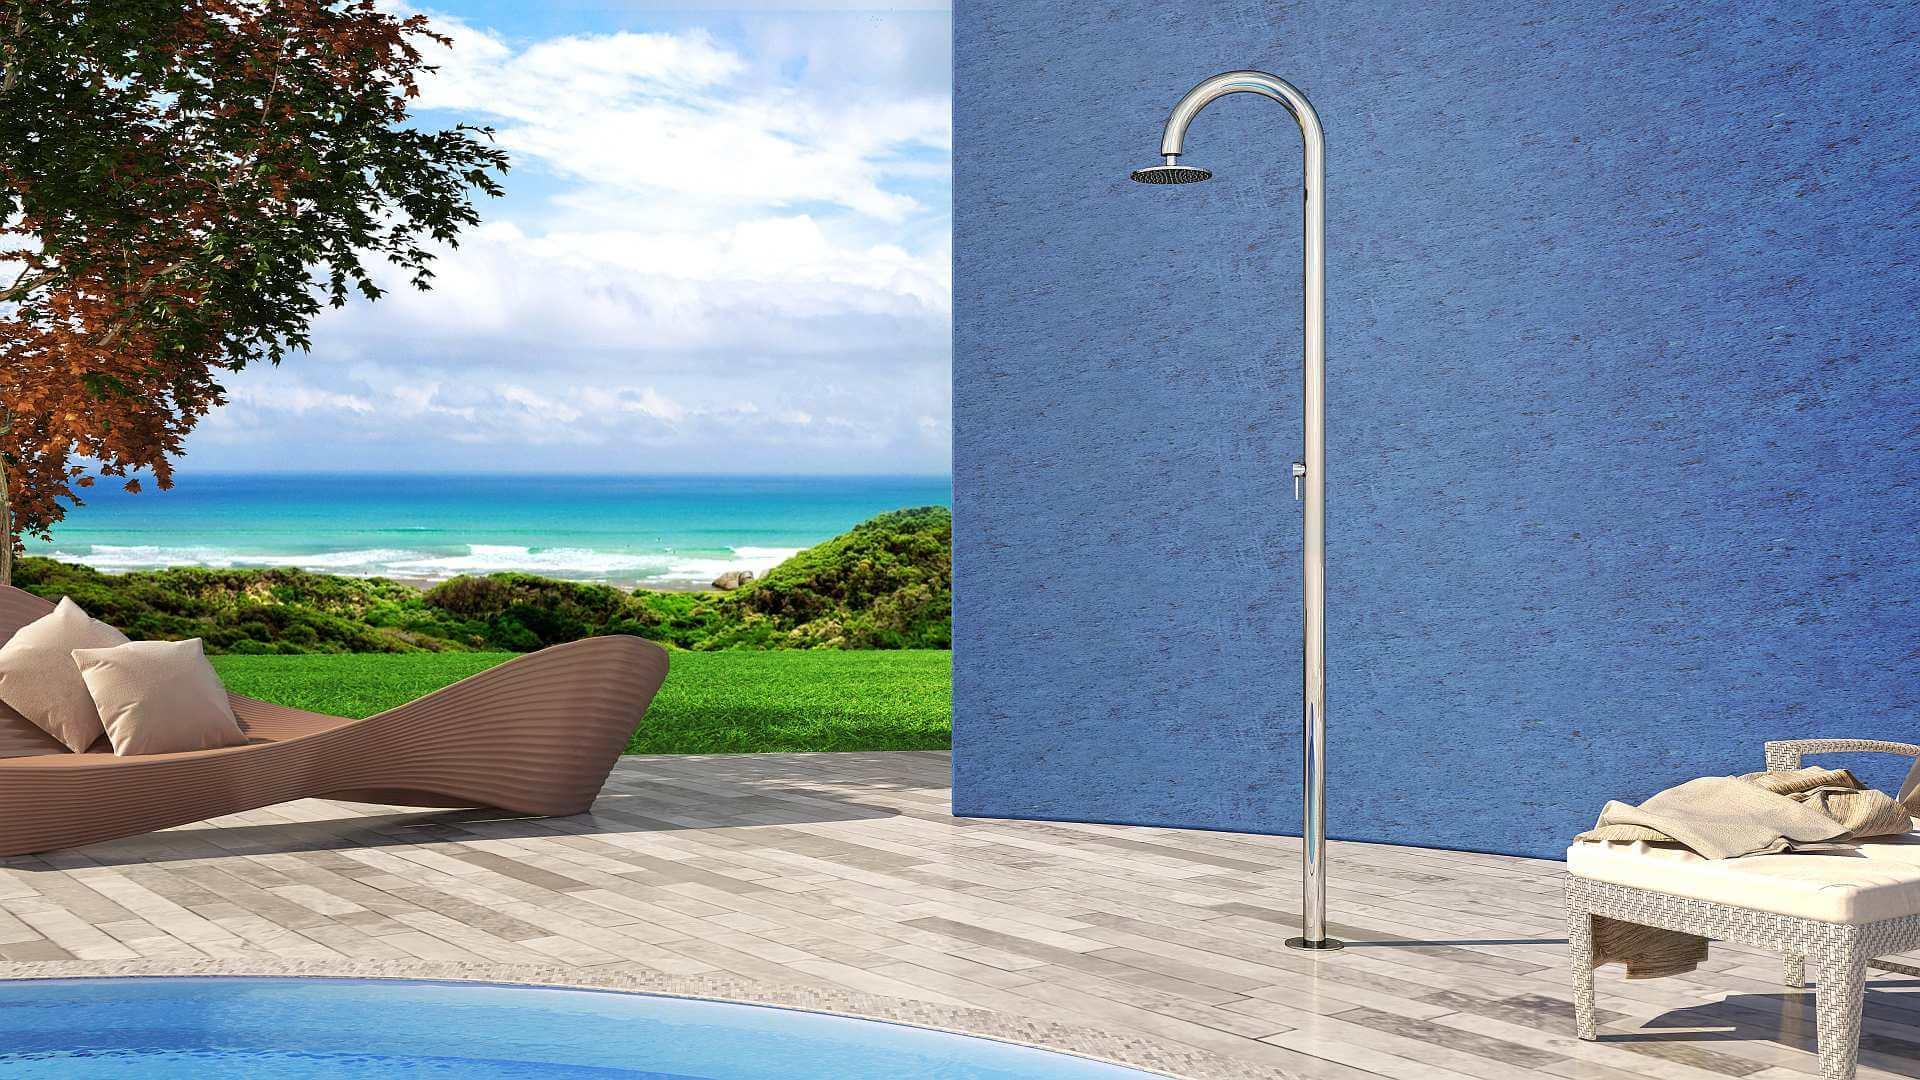 Photo douche extérieure, piscine, jardin - Sole 60 Inoxstyle